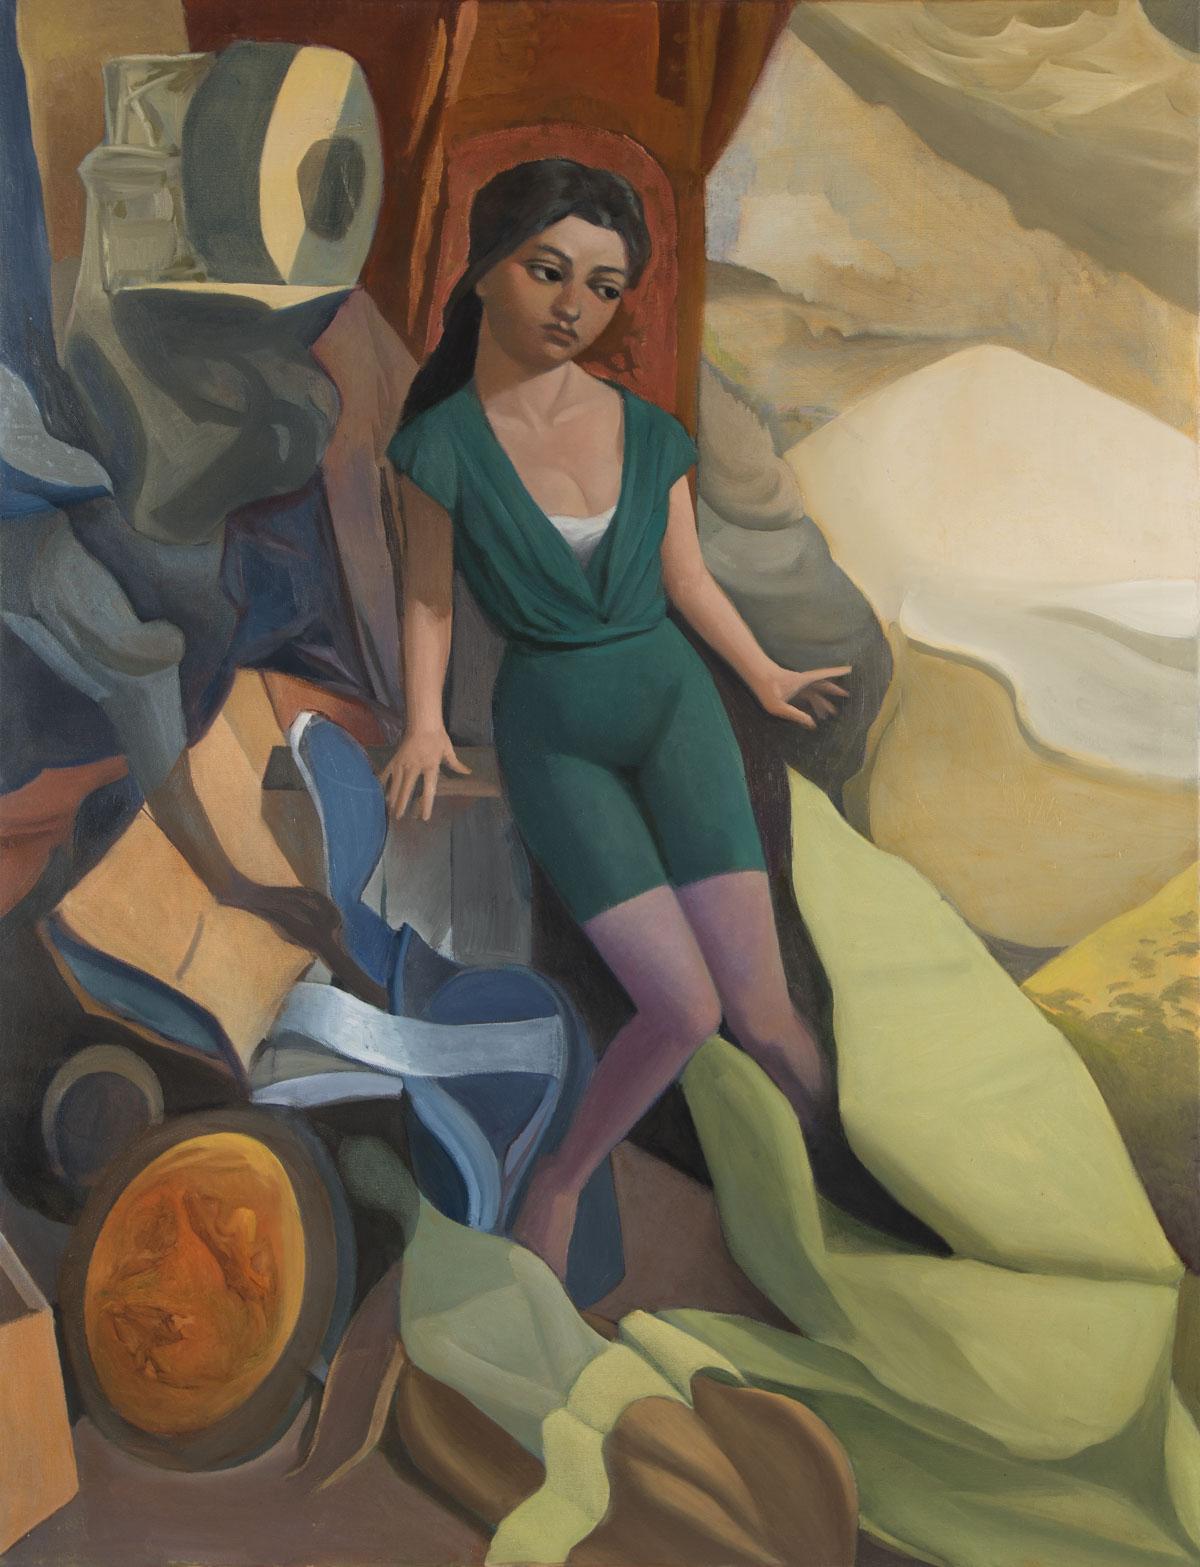 PÑ003 Paco Ñíguez Sin título Óleo sobre lienzo 116 x 89 cm 2020